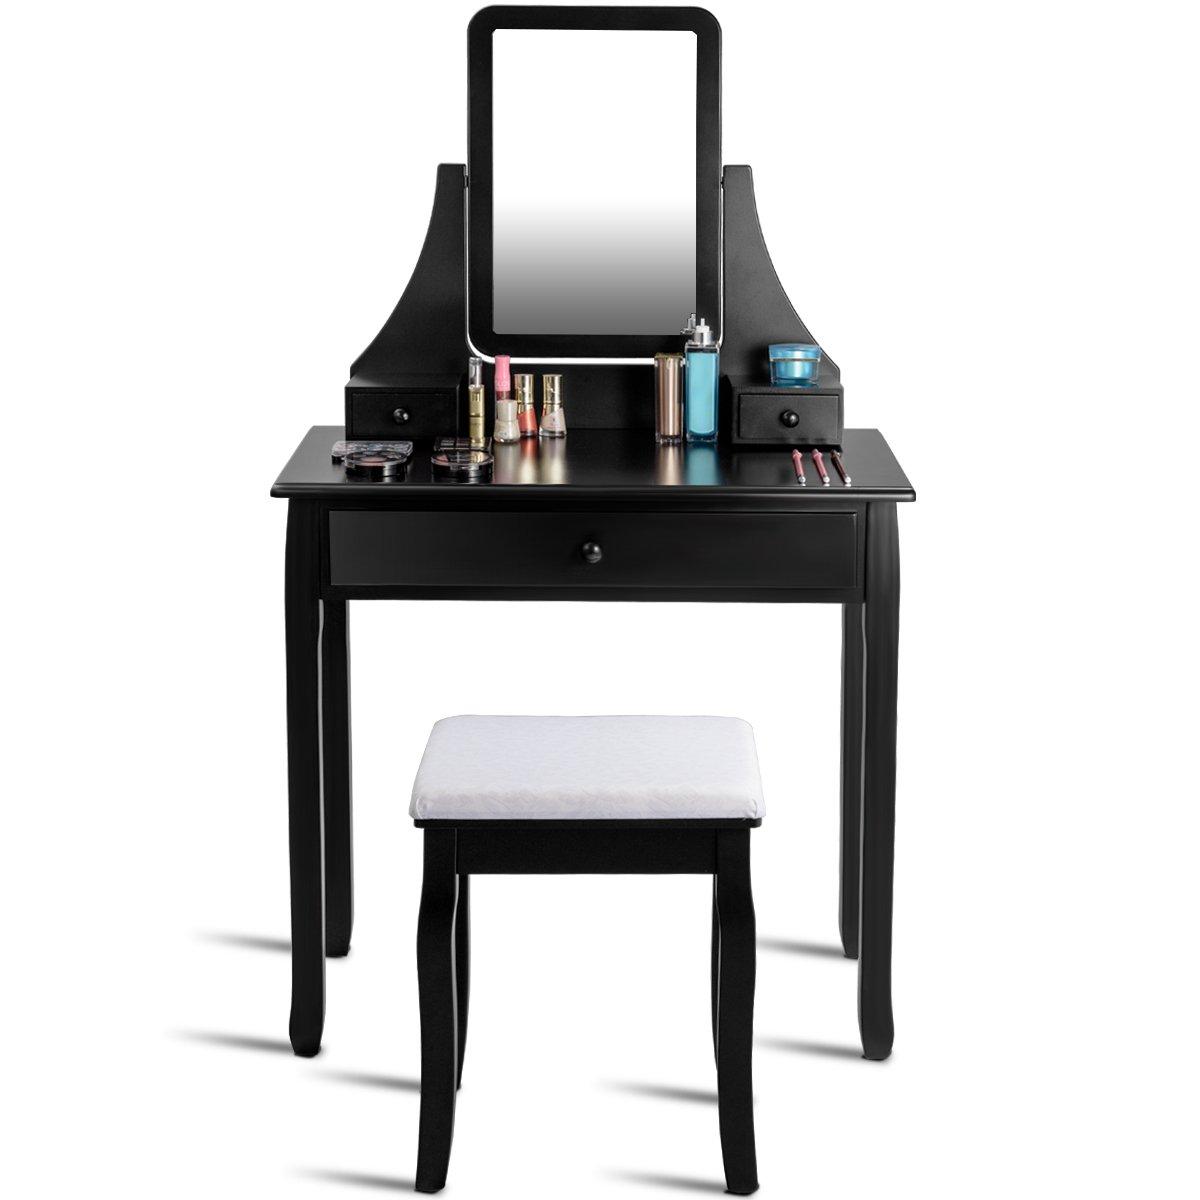 Giantex Bathroom Vanity Dressing Table Set 360 Rotate Mirror Pine Wood Legs Padded Stool Dressing Table Girls Make Up Vanity Set w/Stool (Rectangle Mirror 3 Drawers) (Black)